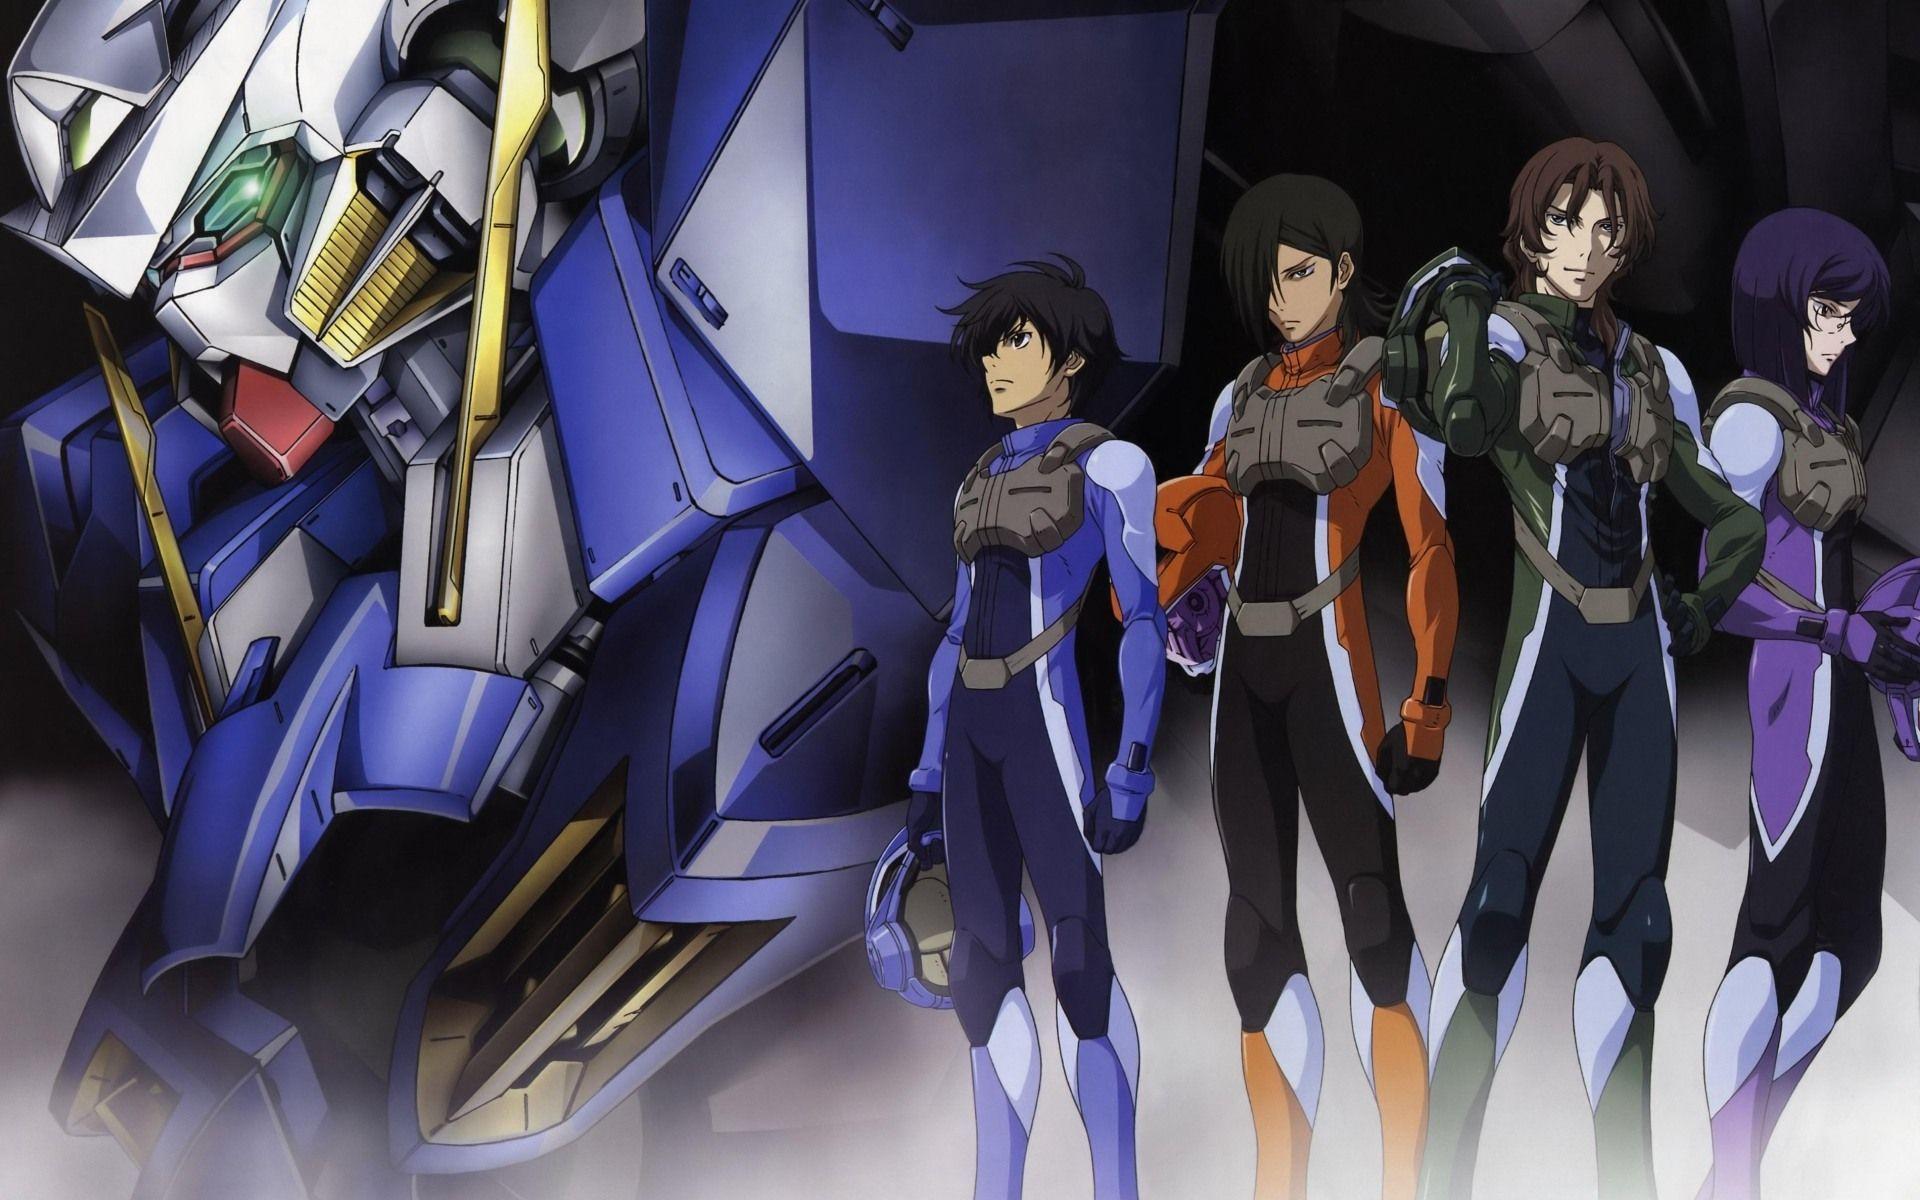 Mobile Suit Gundam 00 Wallpapers - Top Free Mobile Suit Gundam 00  Backgrounds - WallpaperAccess